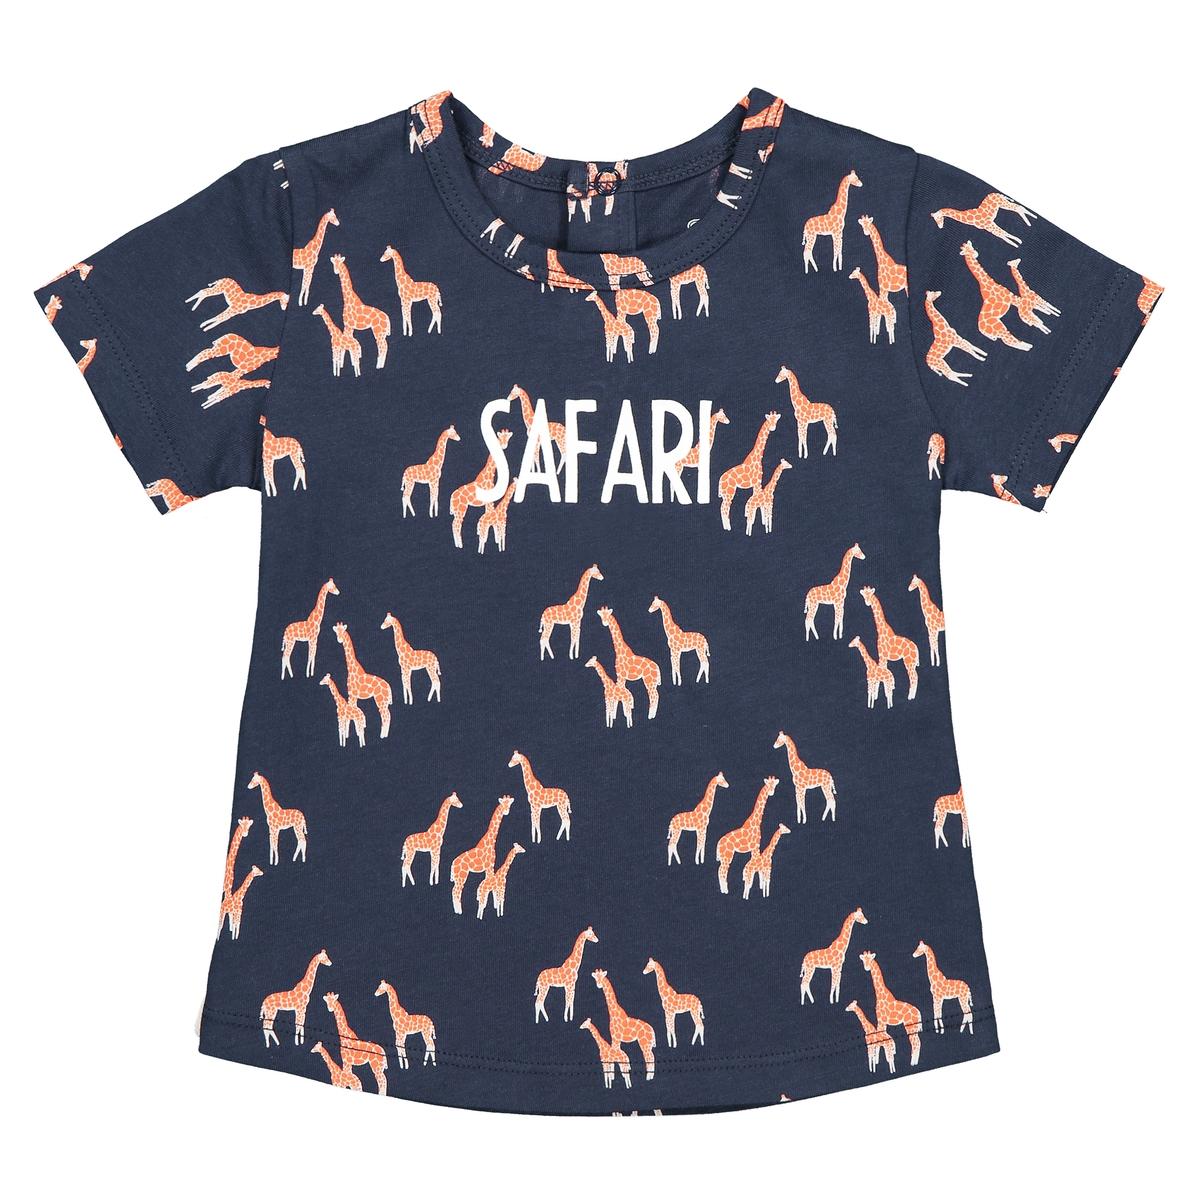 цена на Футболка La Redoute С круглым вырезом и рисунком жирафы мес - года 1 год - 74 см синий